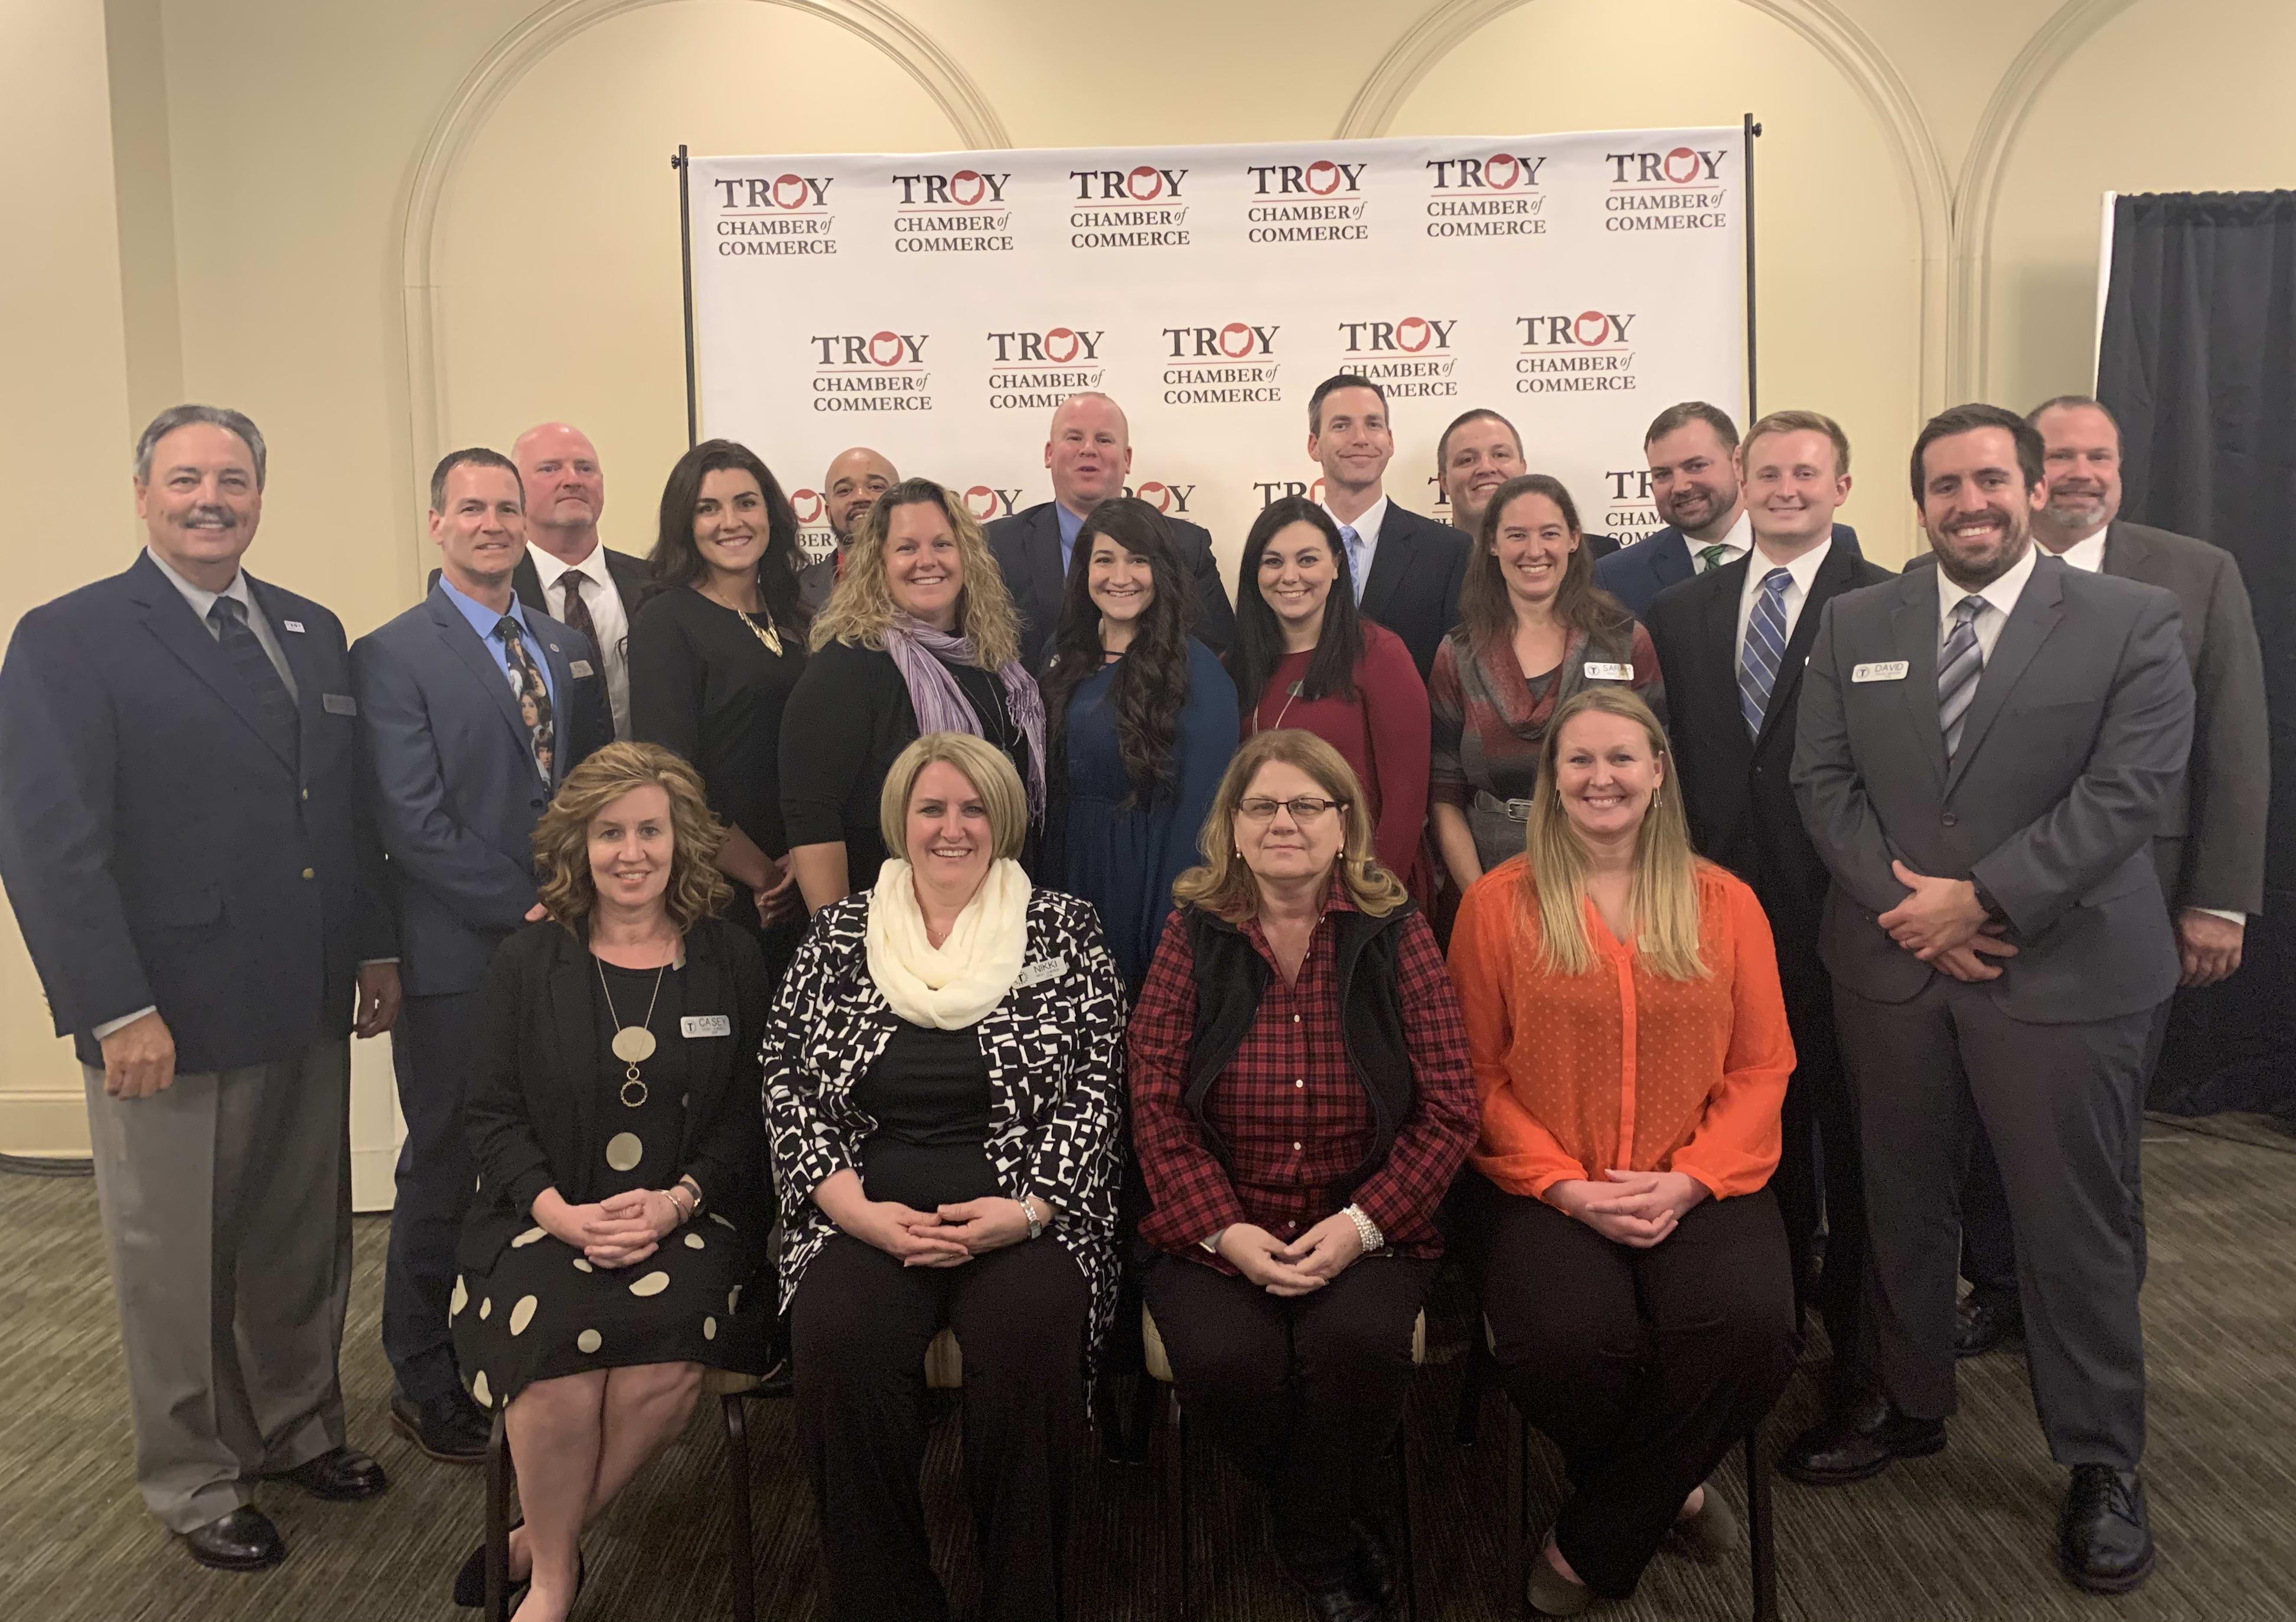 2016 Leadership Troy Class